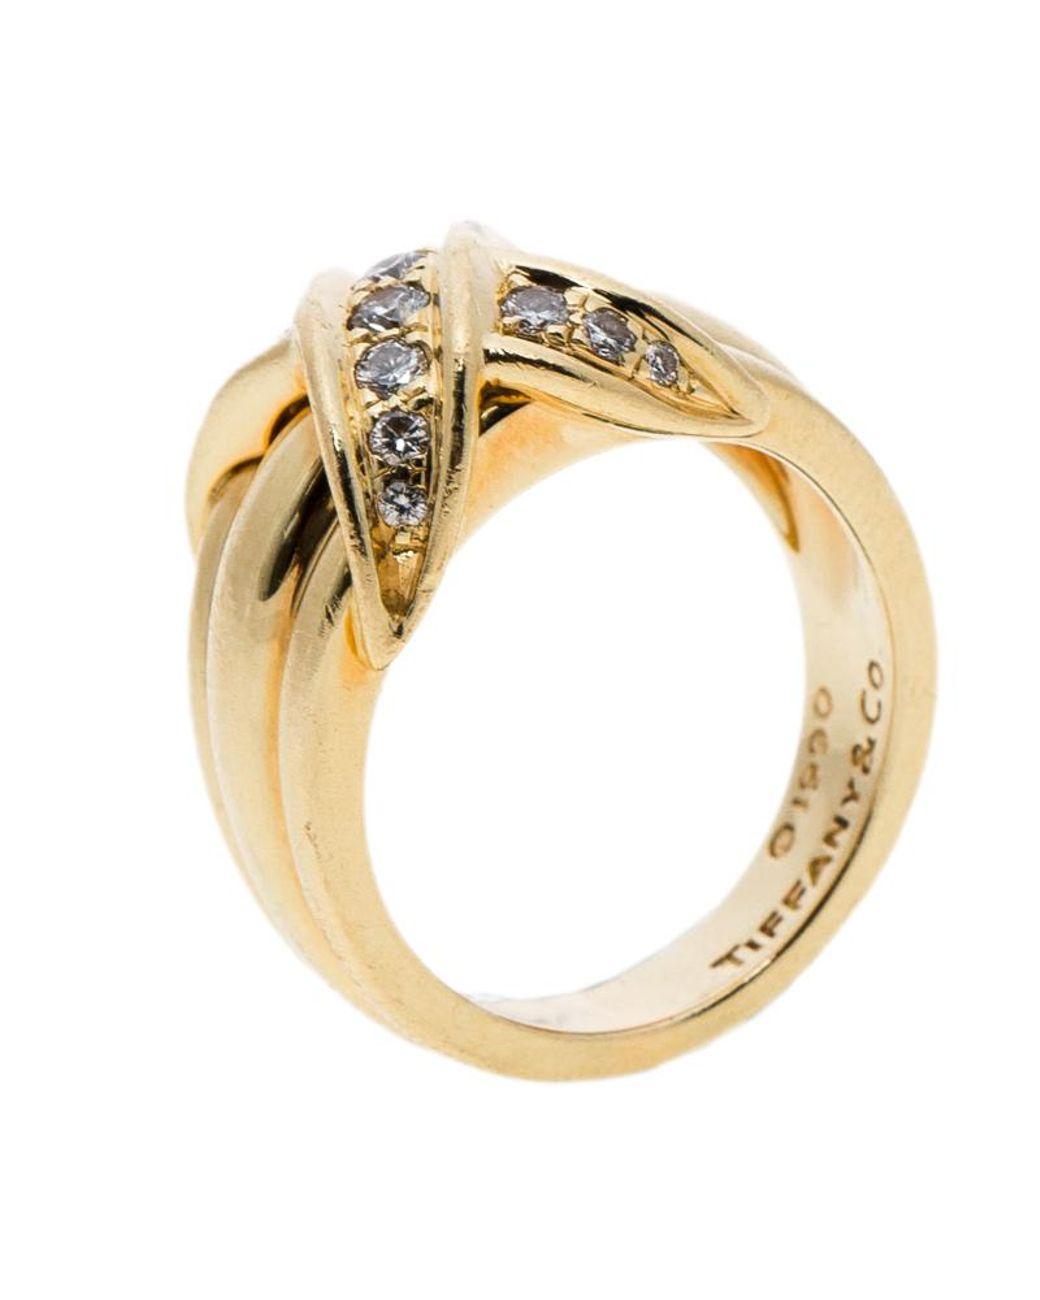 438a08b05 Tiffany & Co. Signature X Kiss Diamond & 18k Yellow Gold Ring Size 53 in  Metallic - Lyst